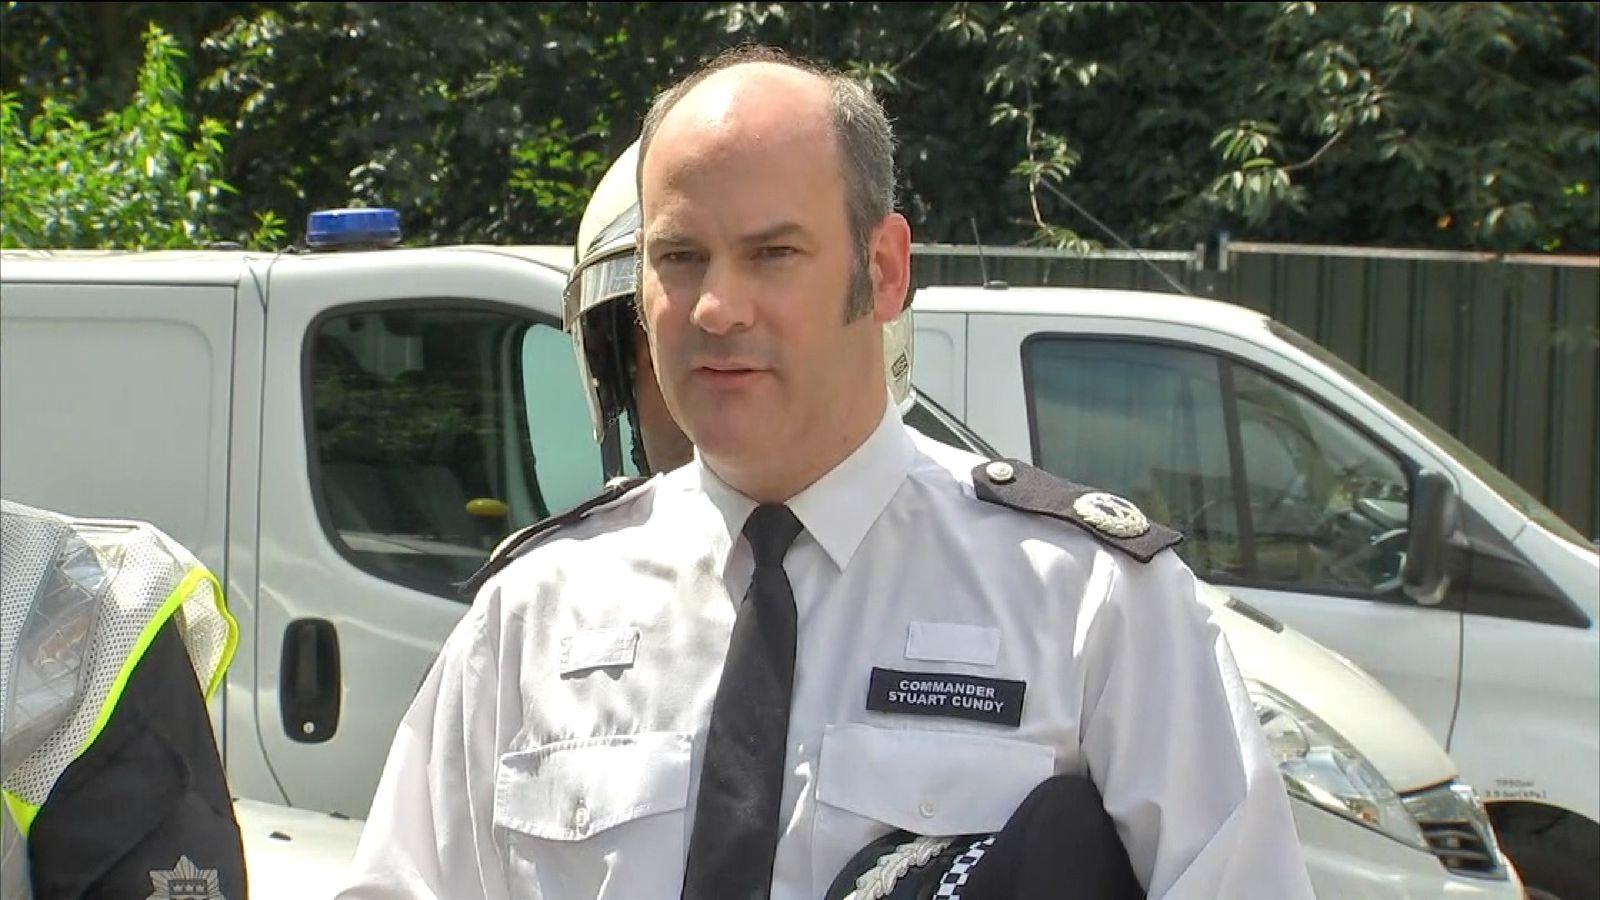 Metropolitan Police Commander Stuart Cundy